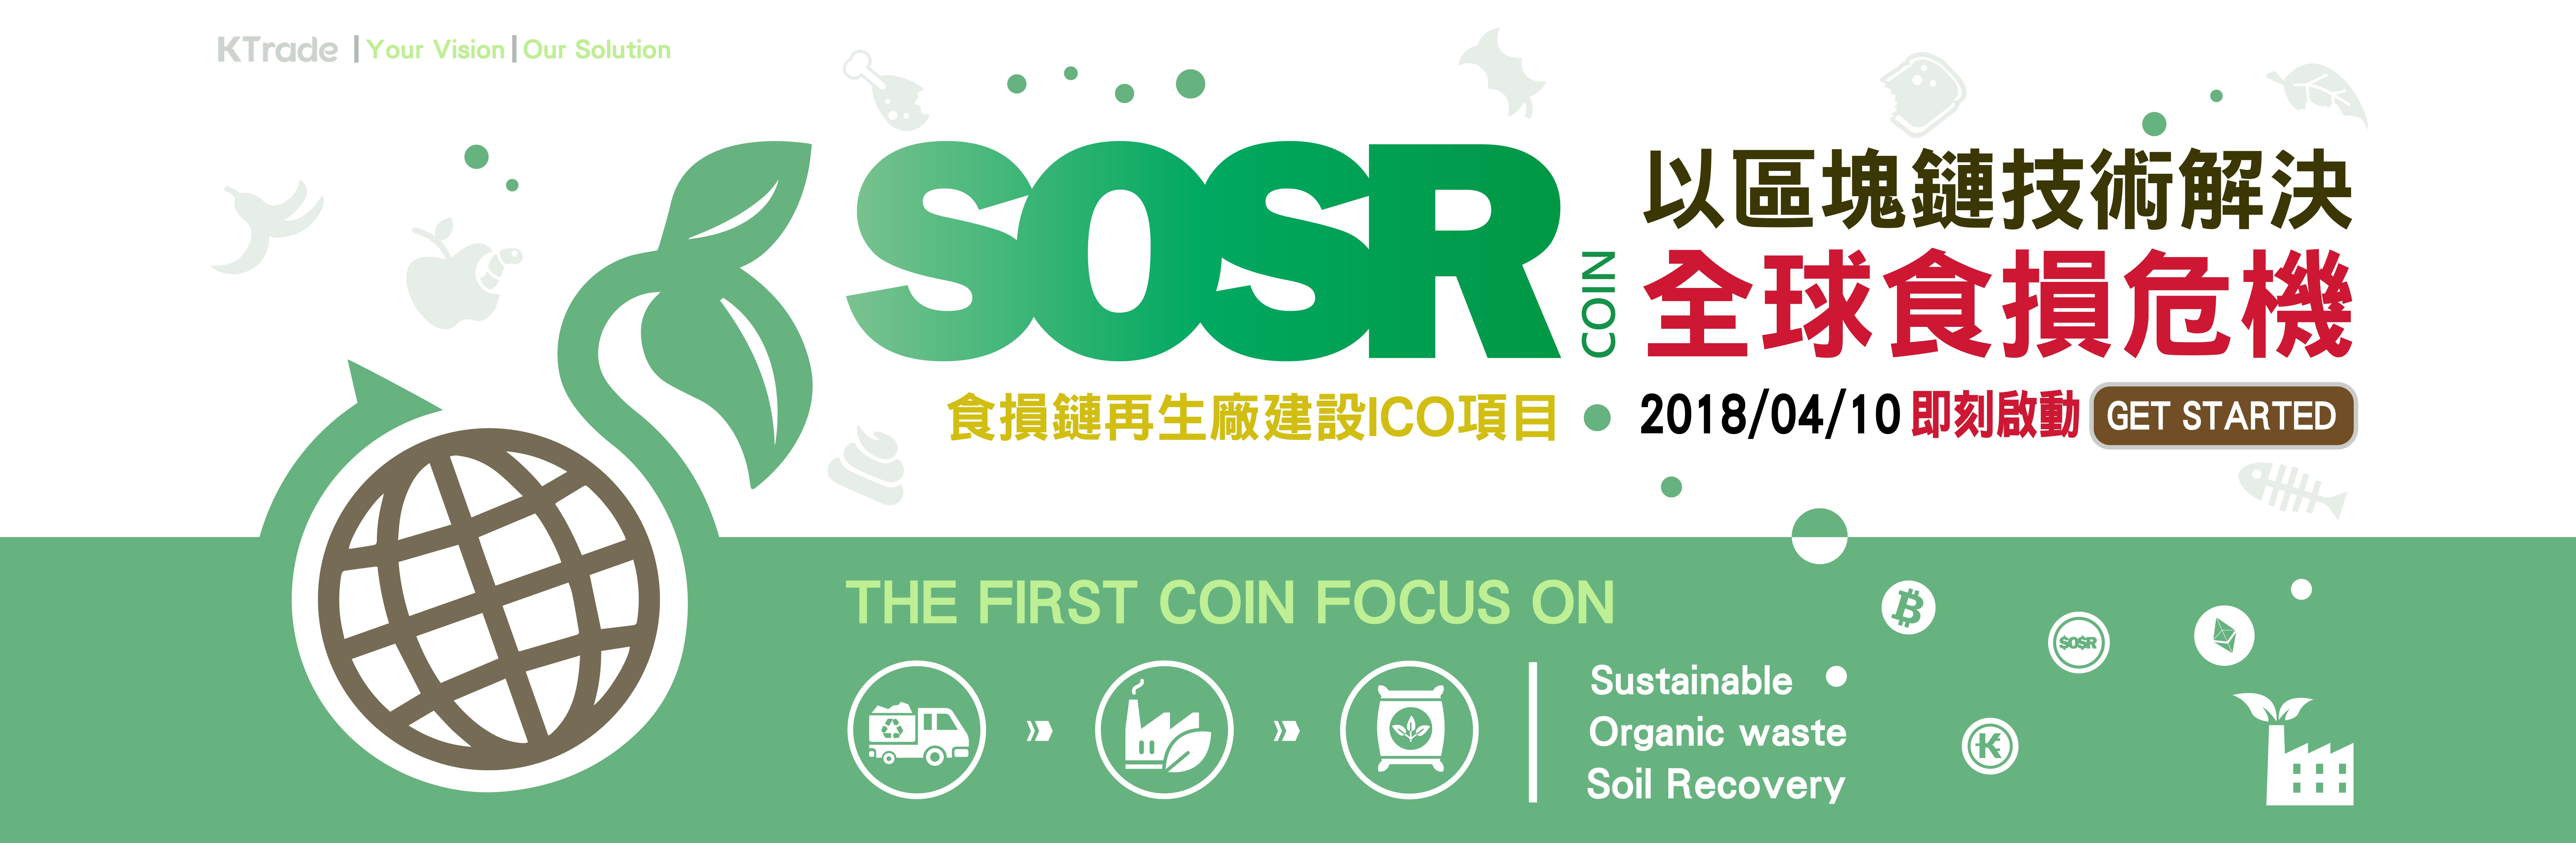 SOSR ICO當日上市公告